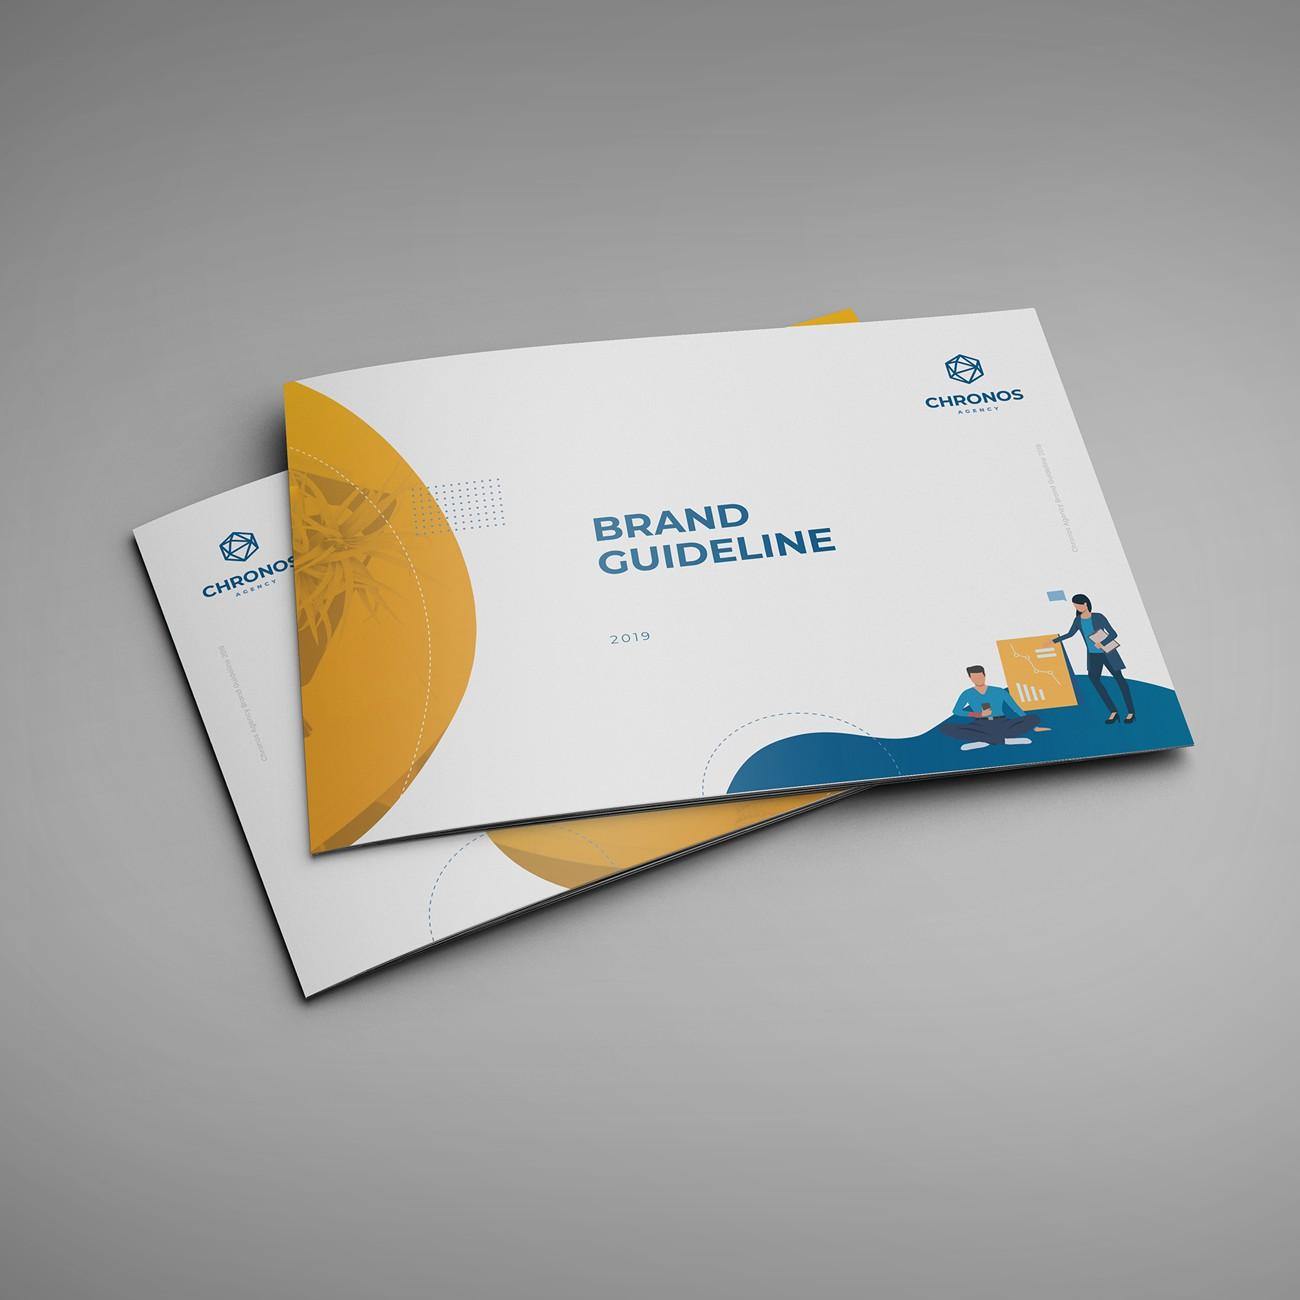 Brand Guide for a Digital Marketing Agency